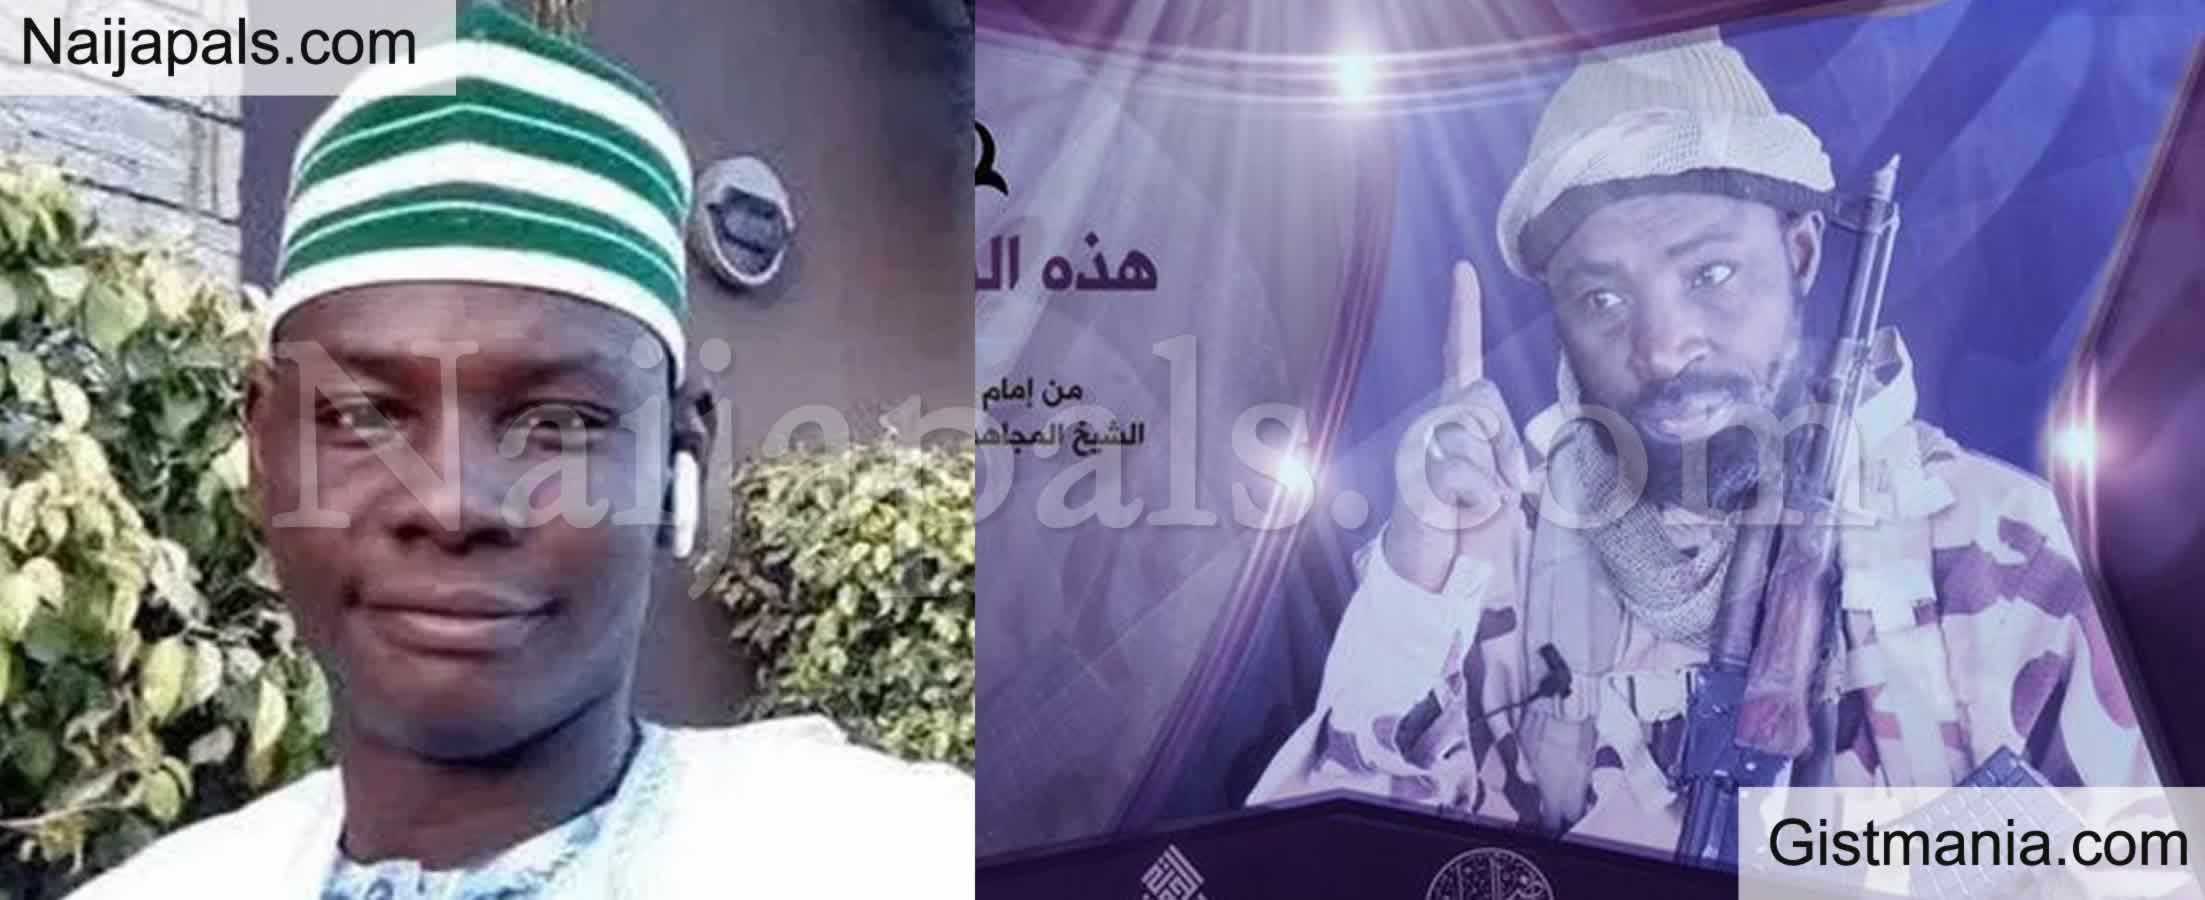 <img alt='.' class='lazyload' data-src='https://img.gistmania.com/emot/comment.gif' /> Boko Haram Leader,<b> Abubakar Shekau Condemns Death Sentence on Kano Musician in New Audio</b>